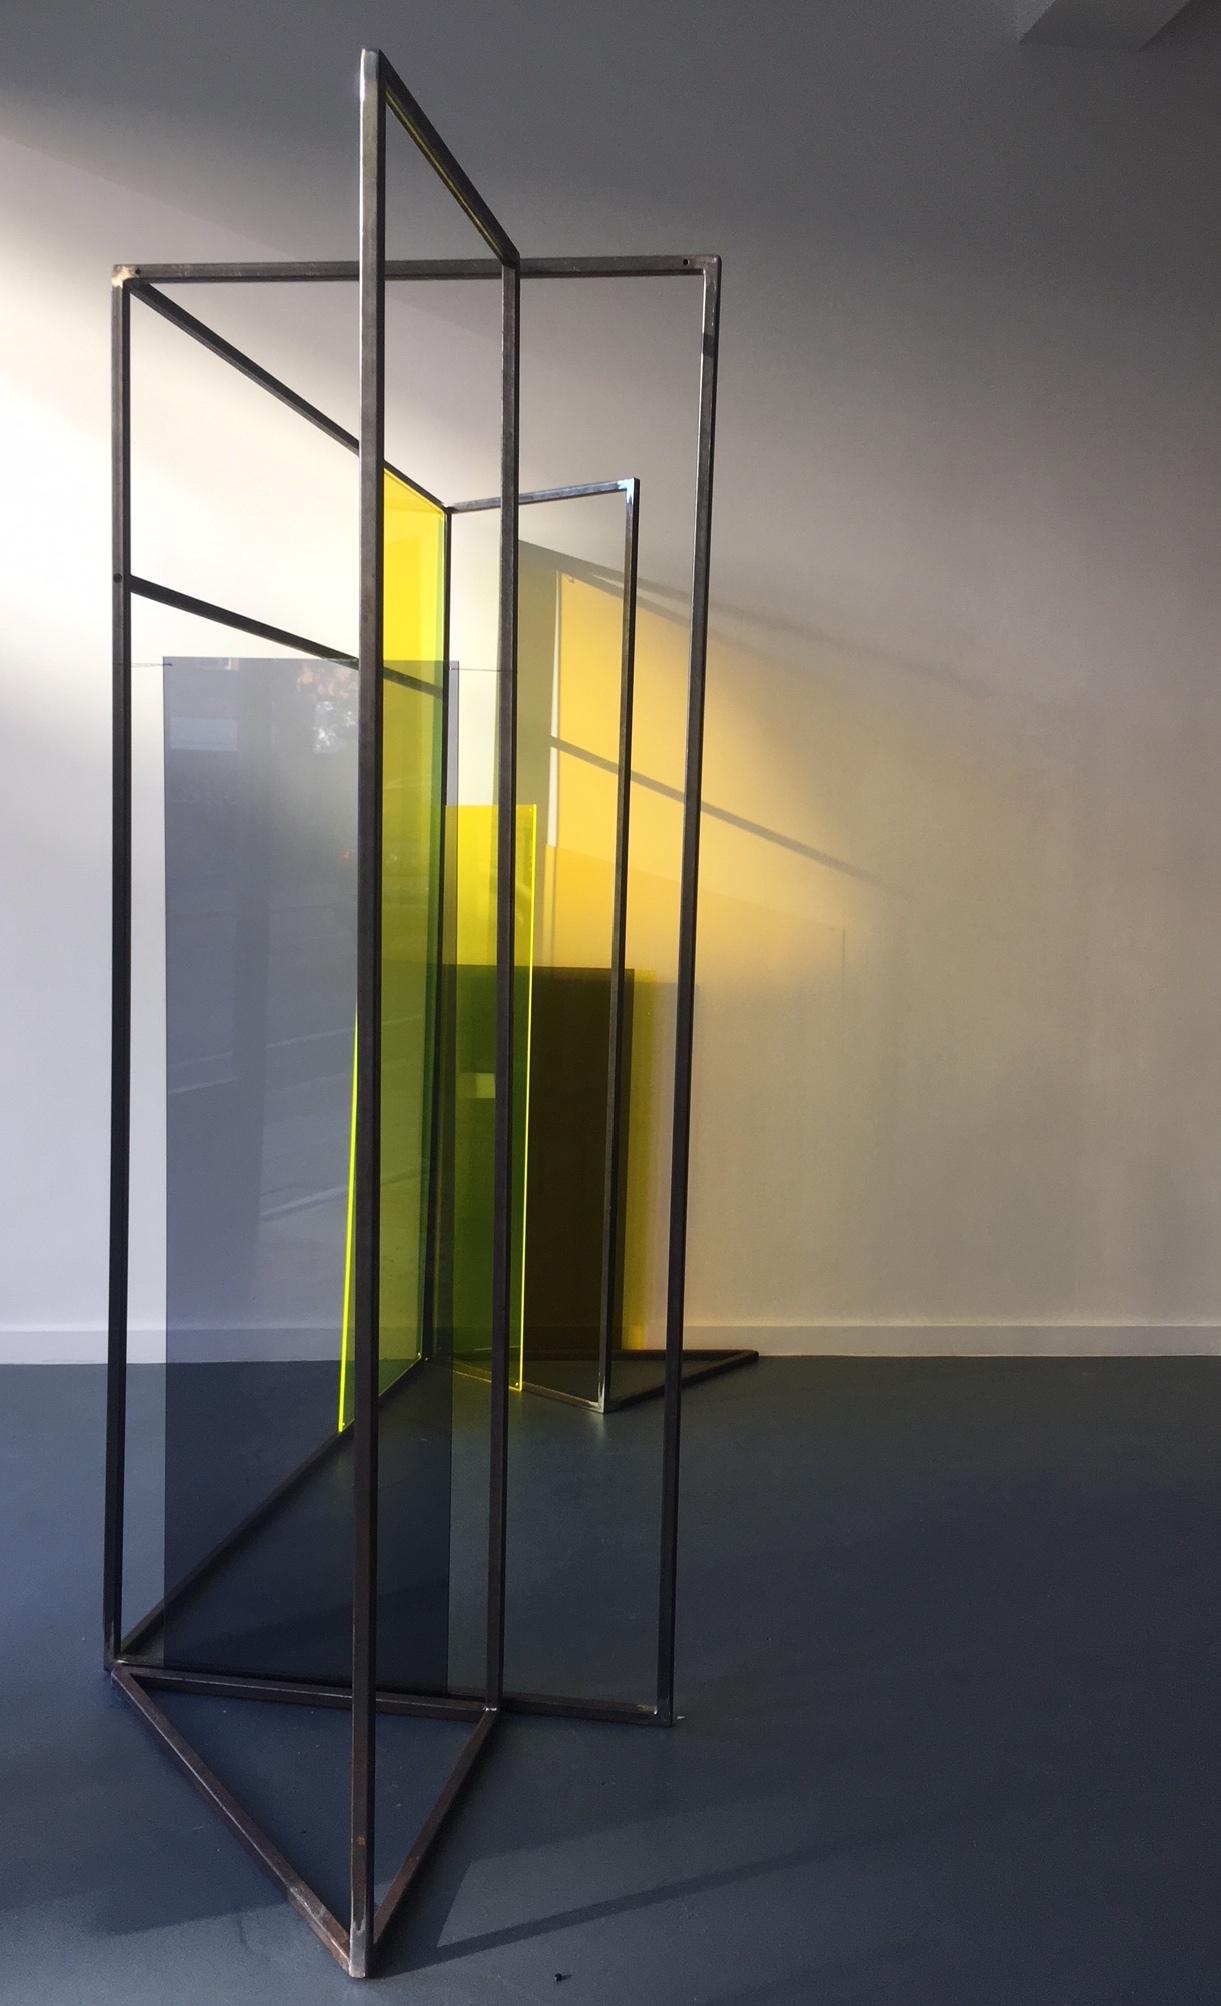 Rosalind+Davis.+Haus+Konstructiv.+Bo+Lee+Gallery.jpg